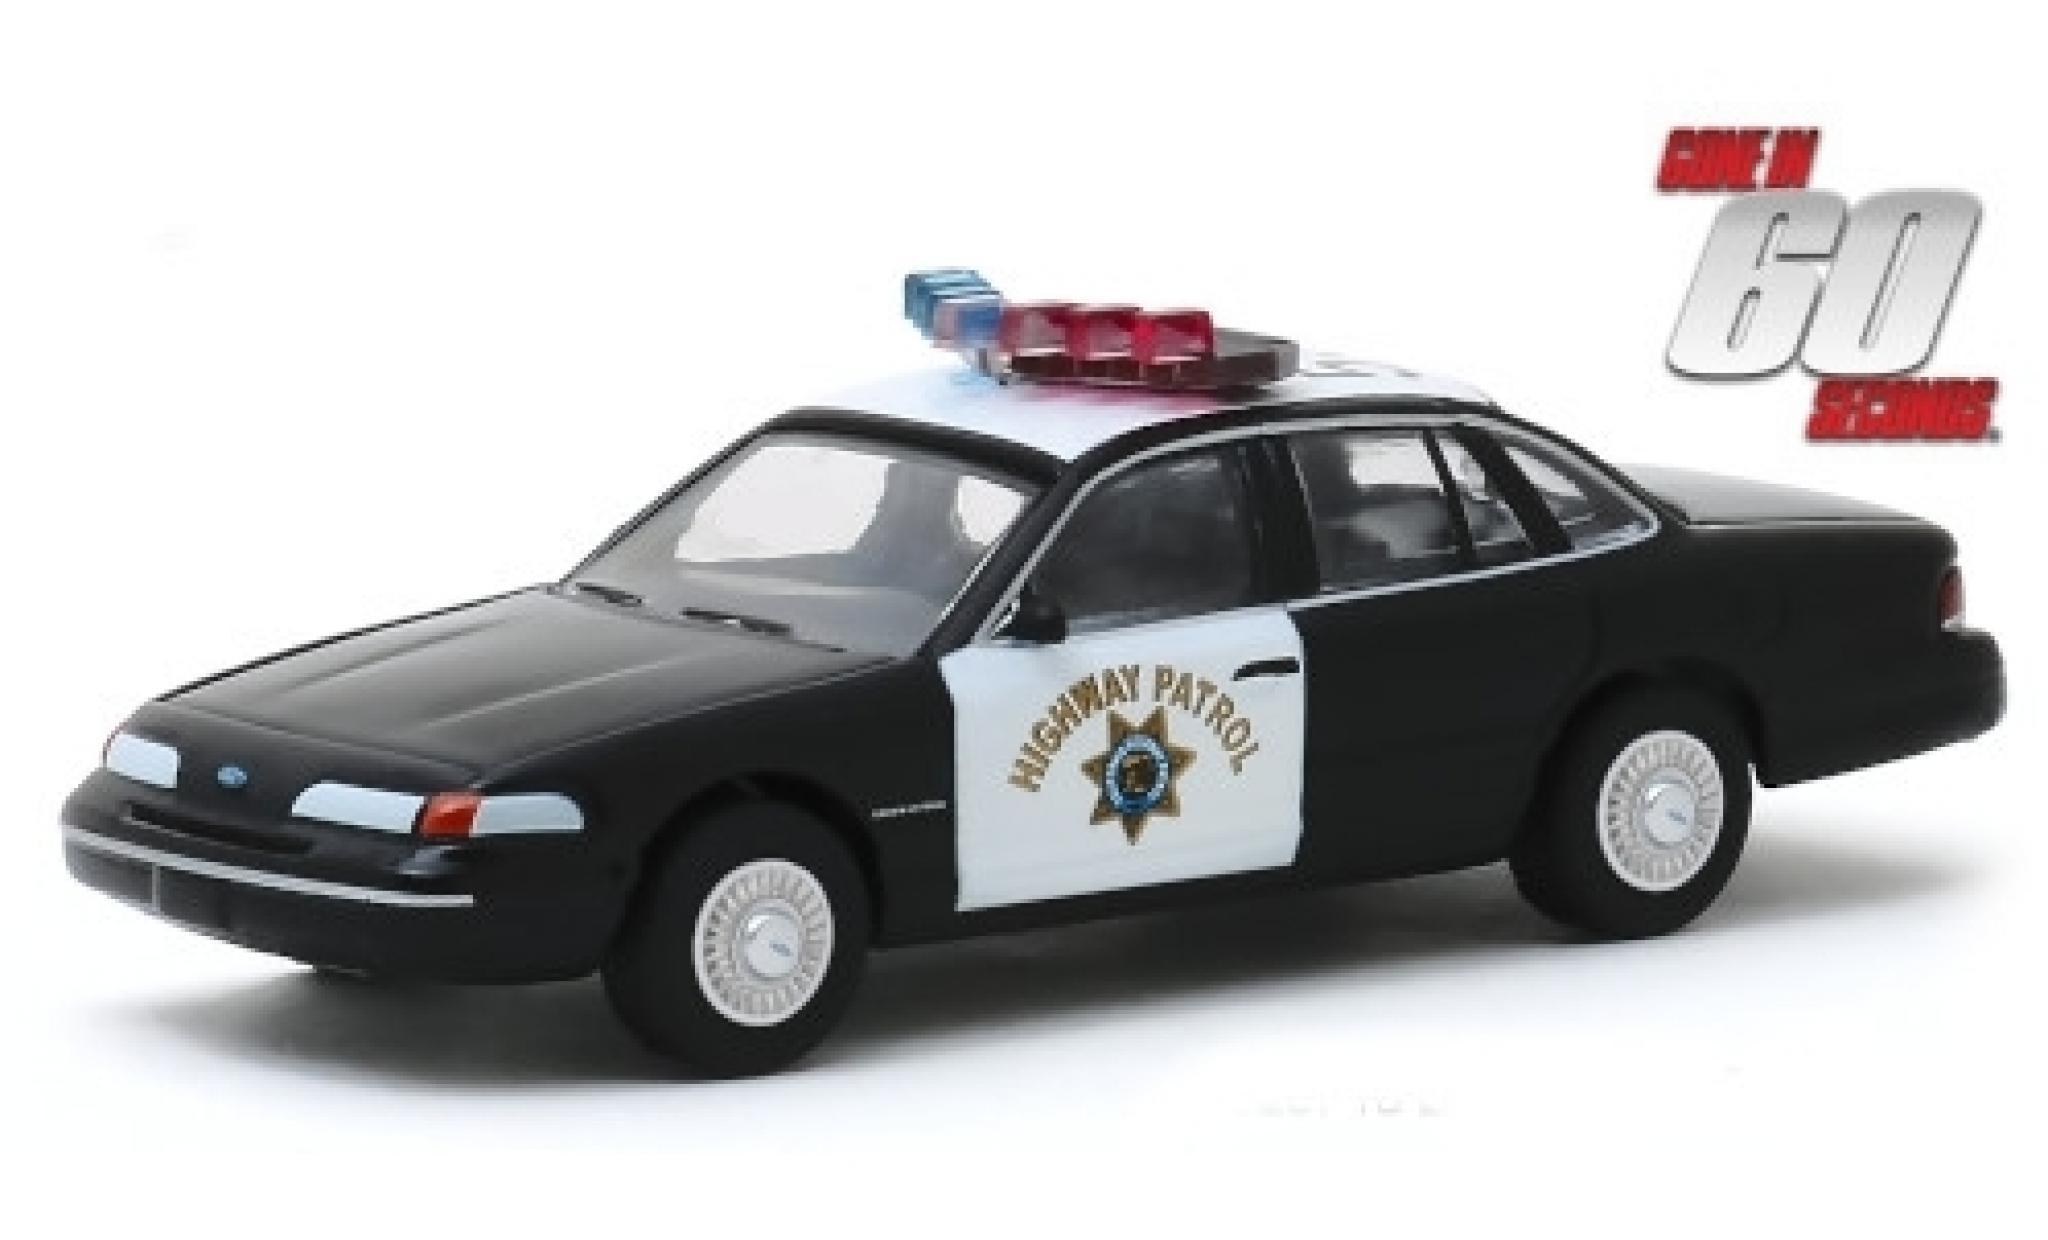 Ford Crown 1/64 Greenlight Victoria Police Interceptor California Highway Patrol 1992 Gone in 60 Seconds